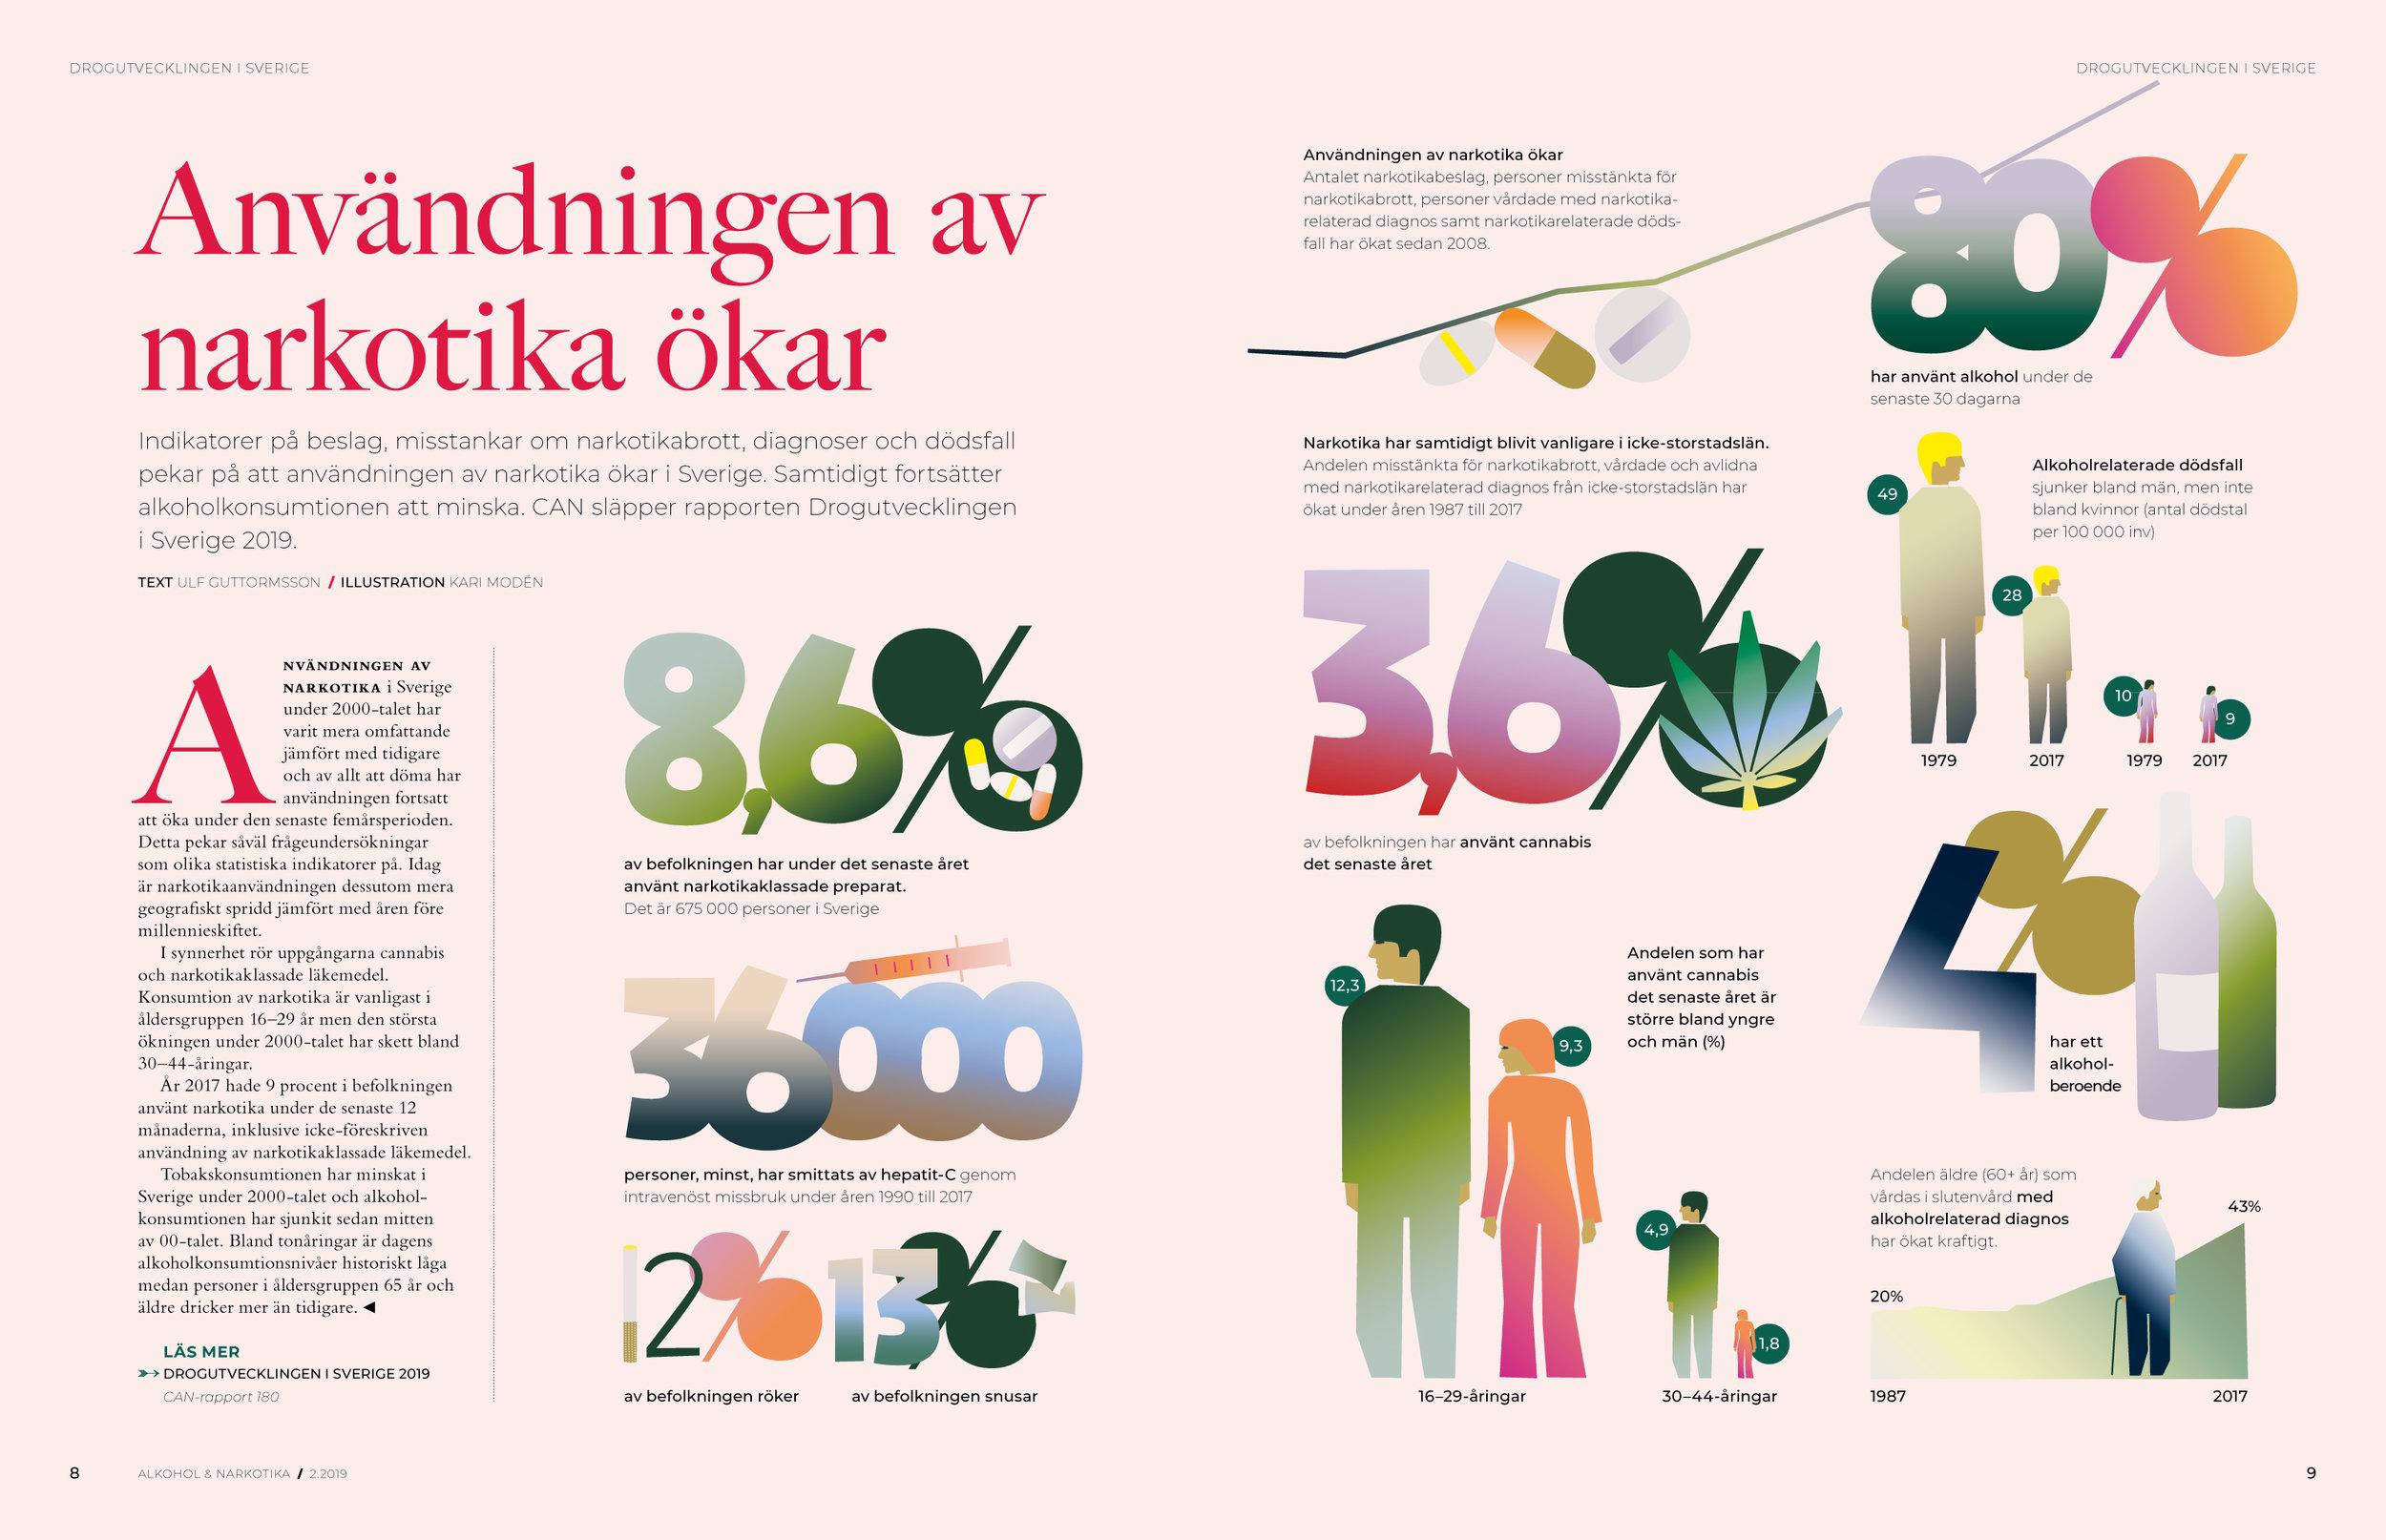 Alkohol & Narkotika | Sweden